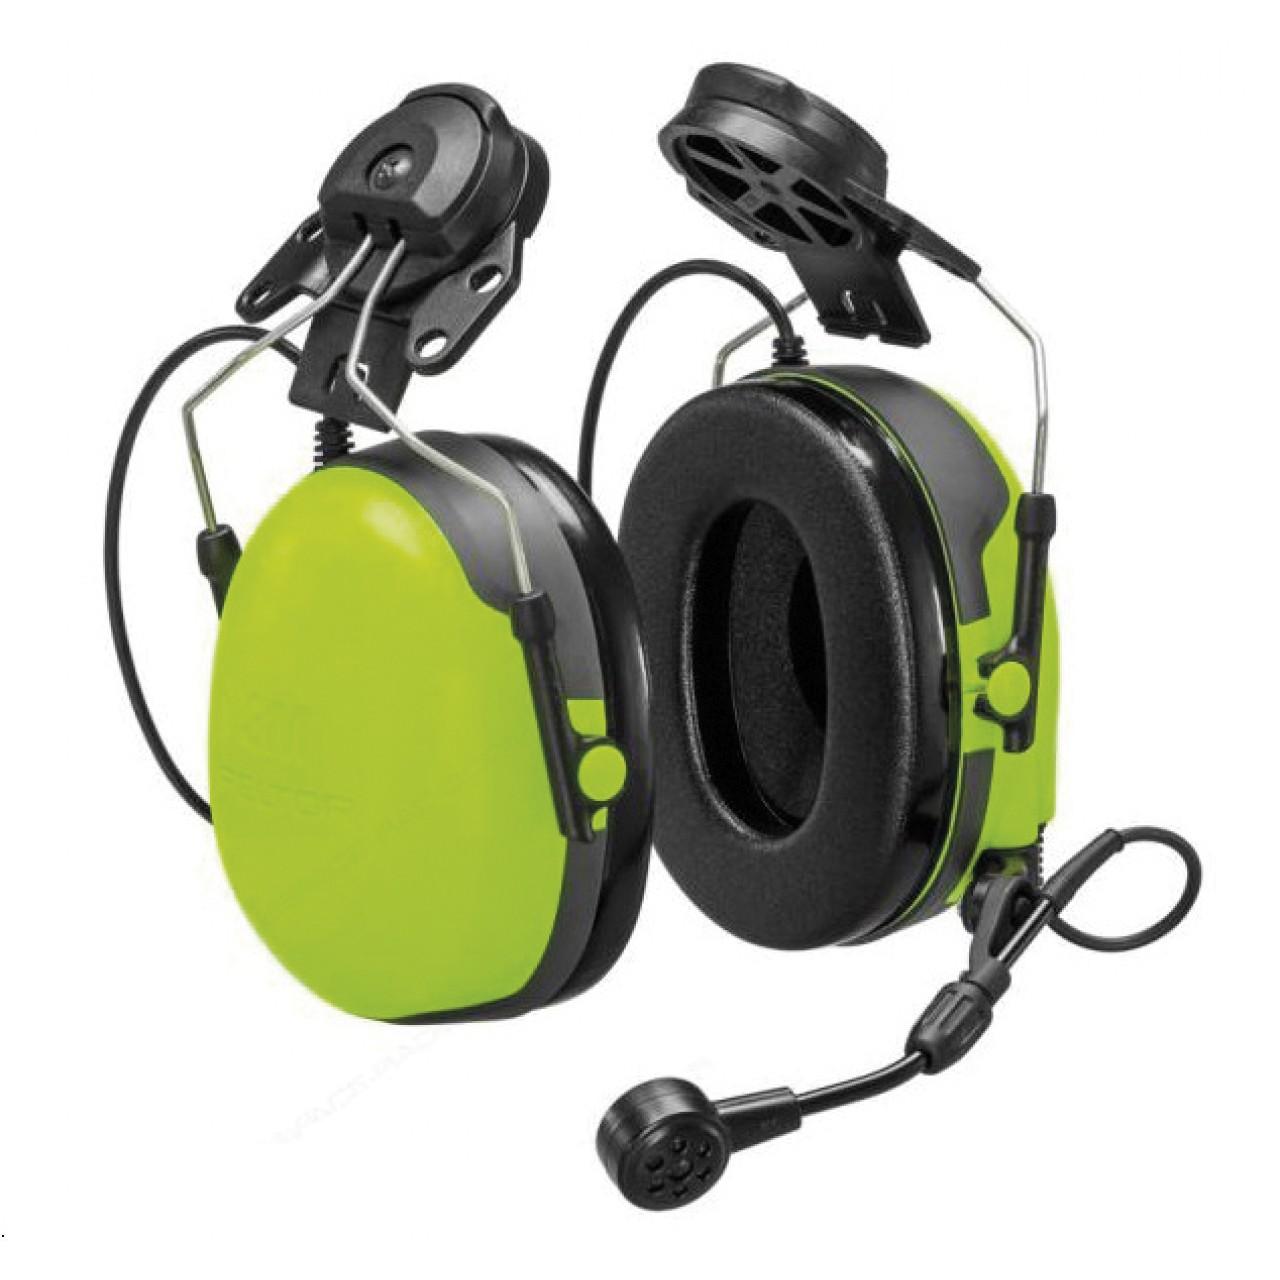 HS-PEPAC-FLEX Headsets and earphones - ICOM